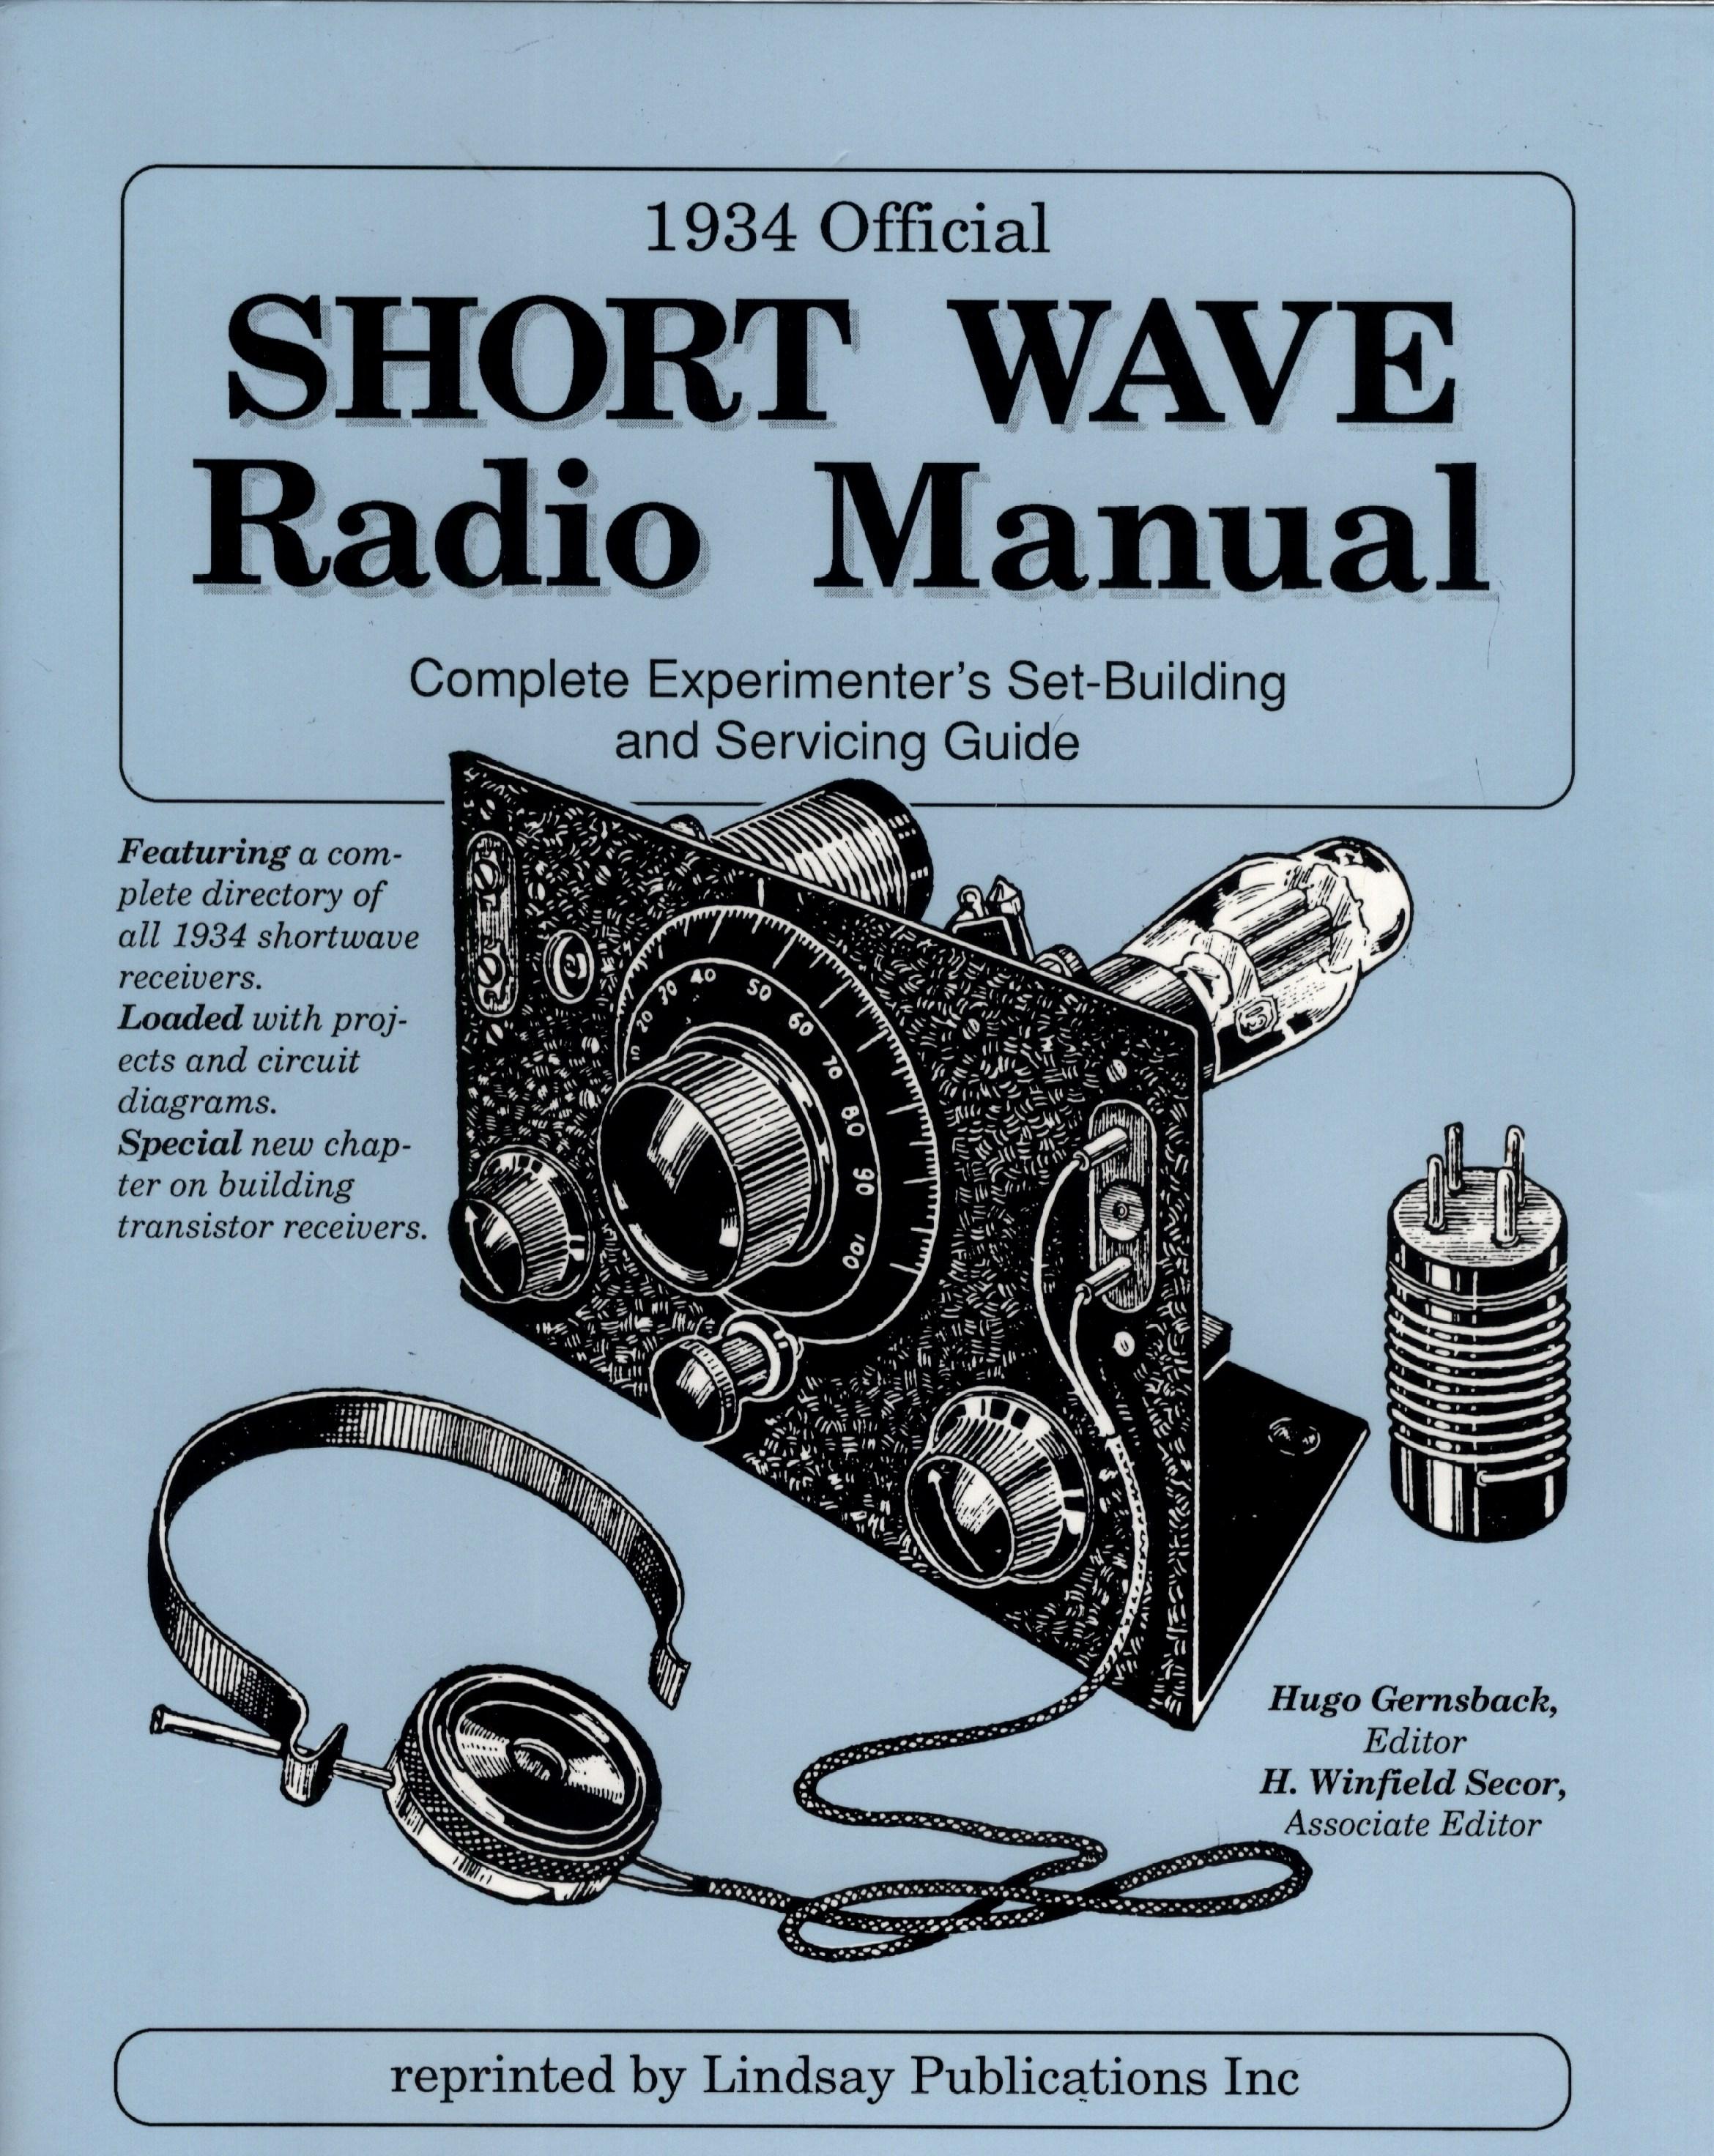 1934 official short wave radio manual